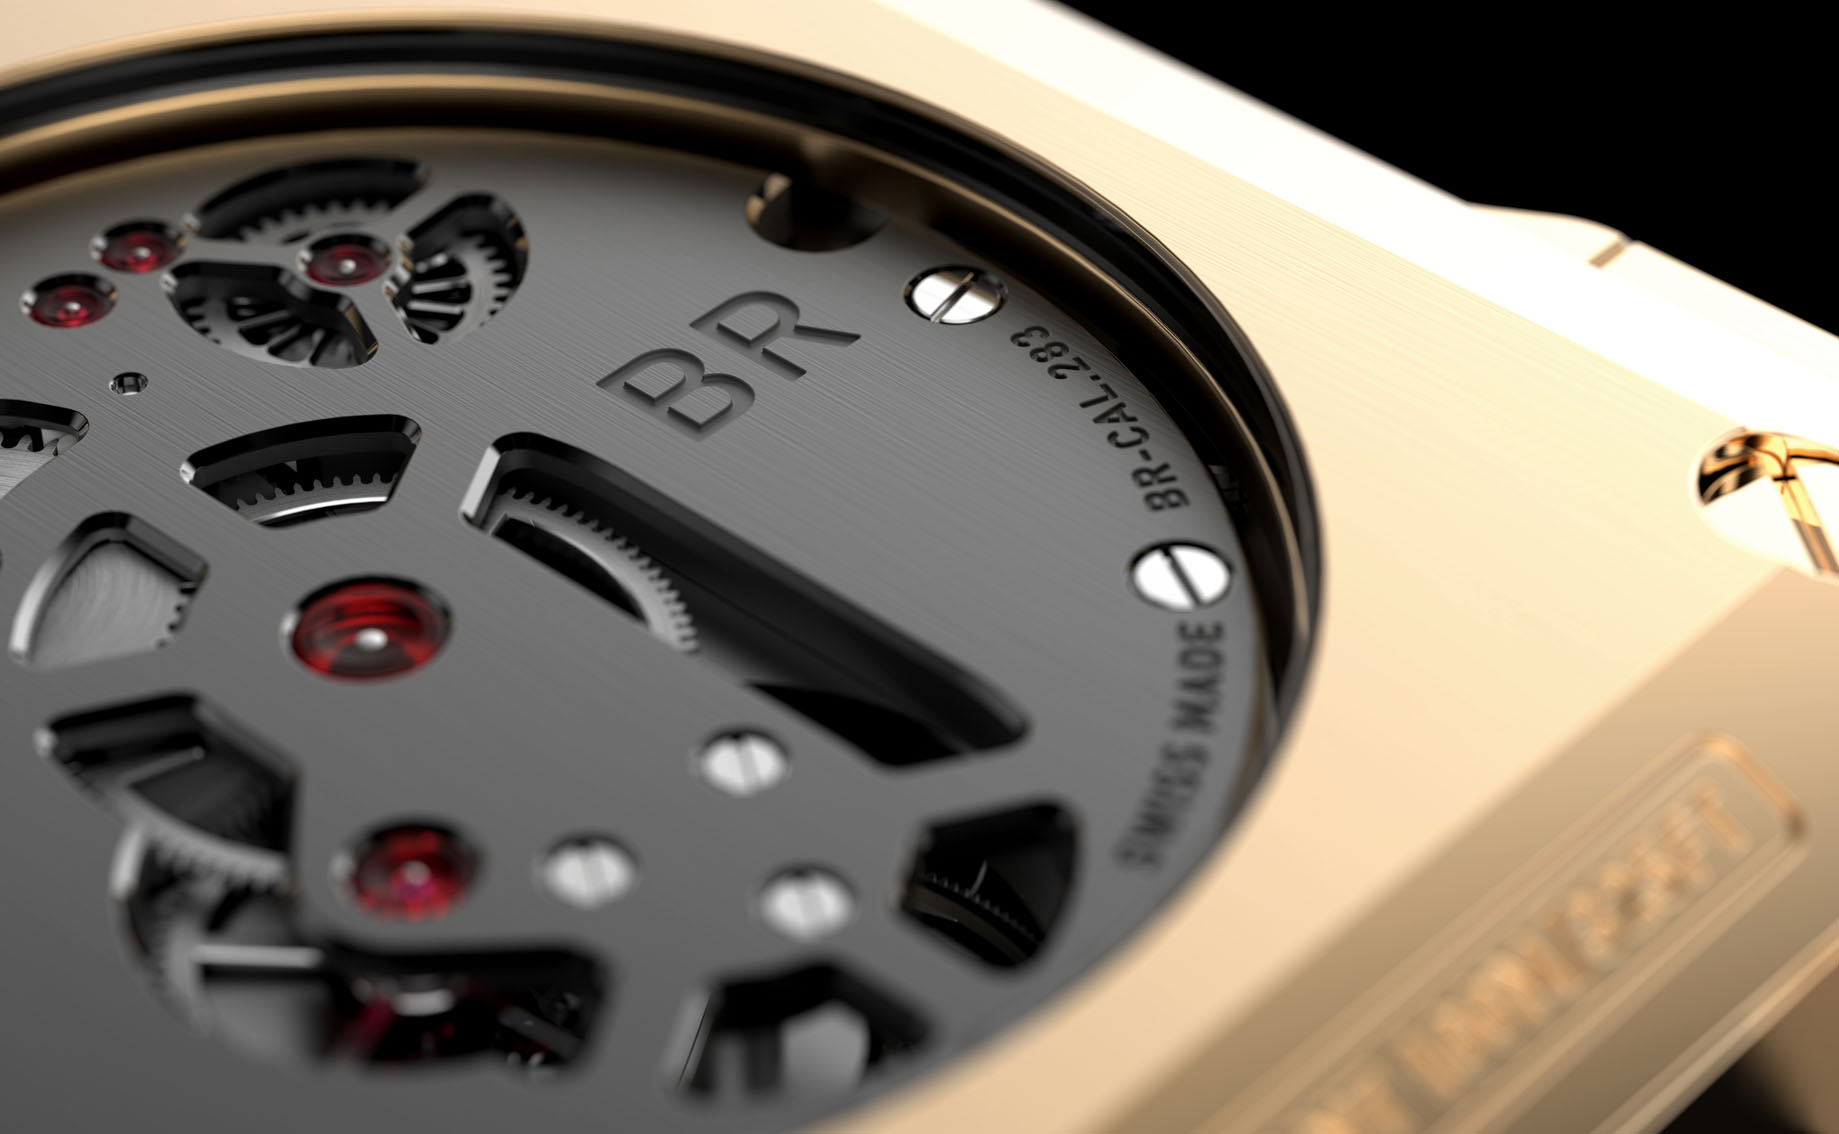 Bell & Ross BRX1 Tourbillon Chronograph